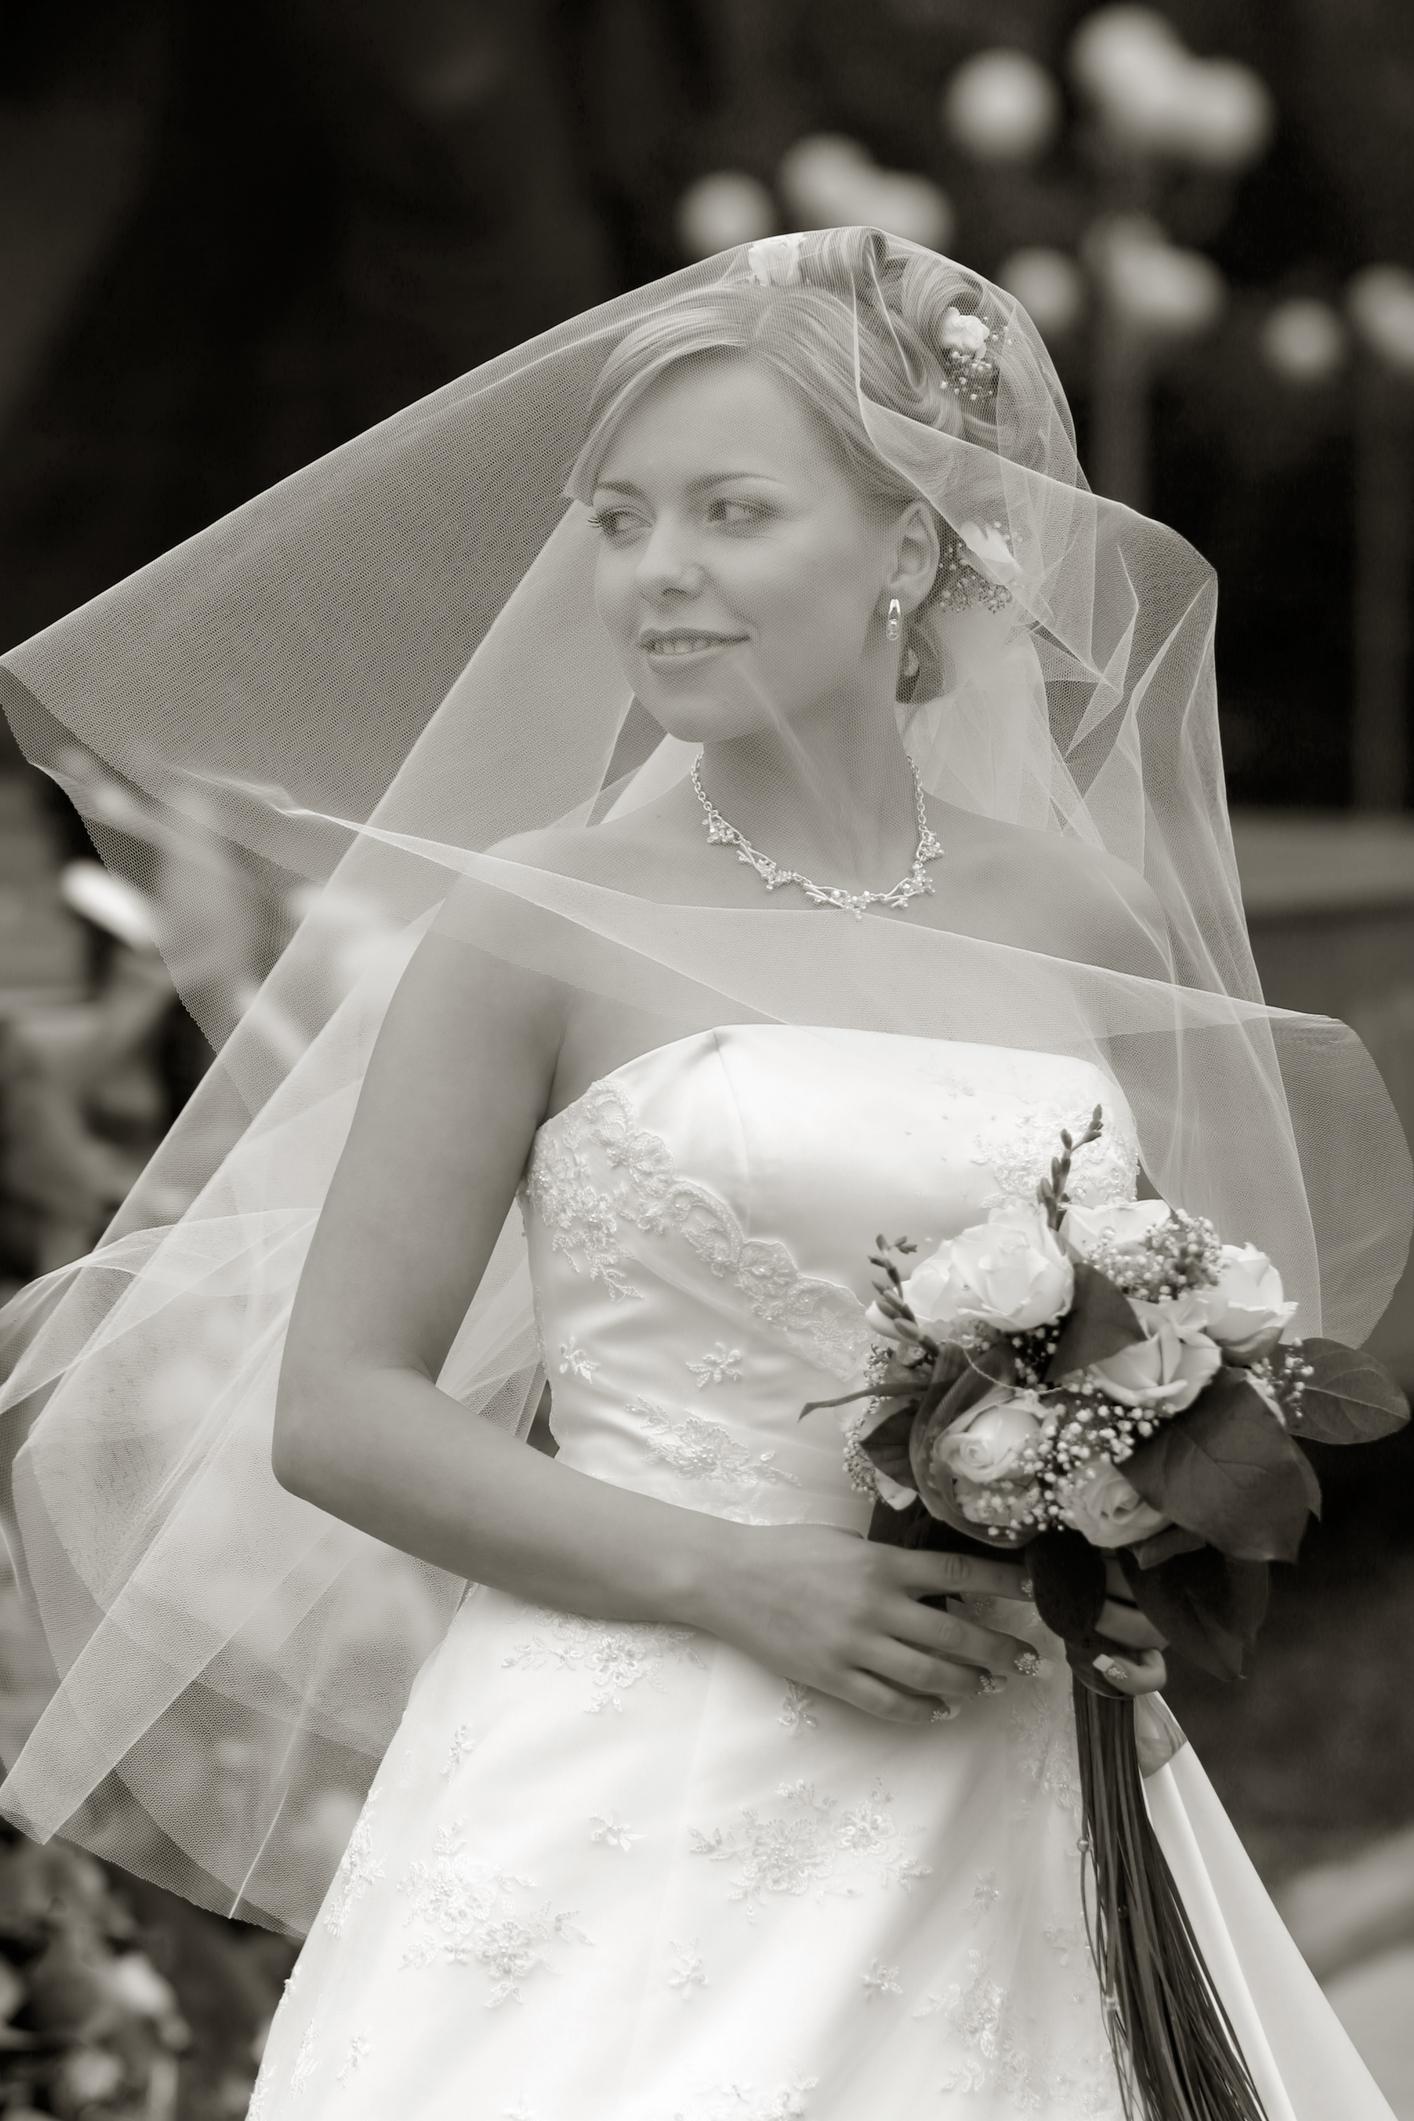 Wedding Dresses, Fashion, white, black, dress, Bride, Donald pope photography